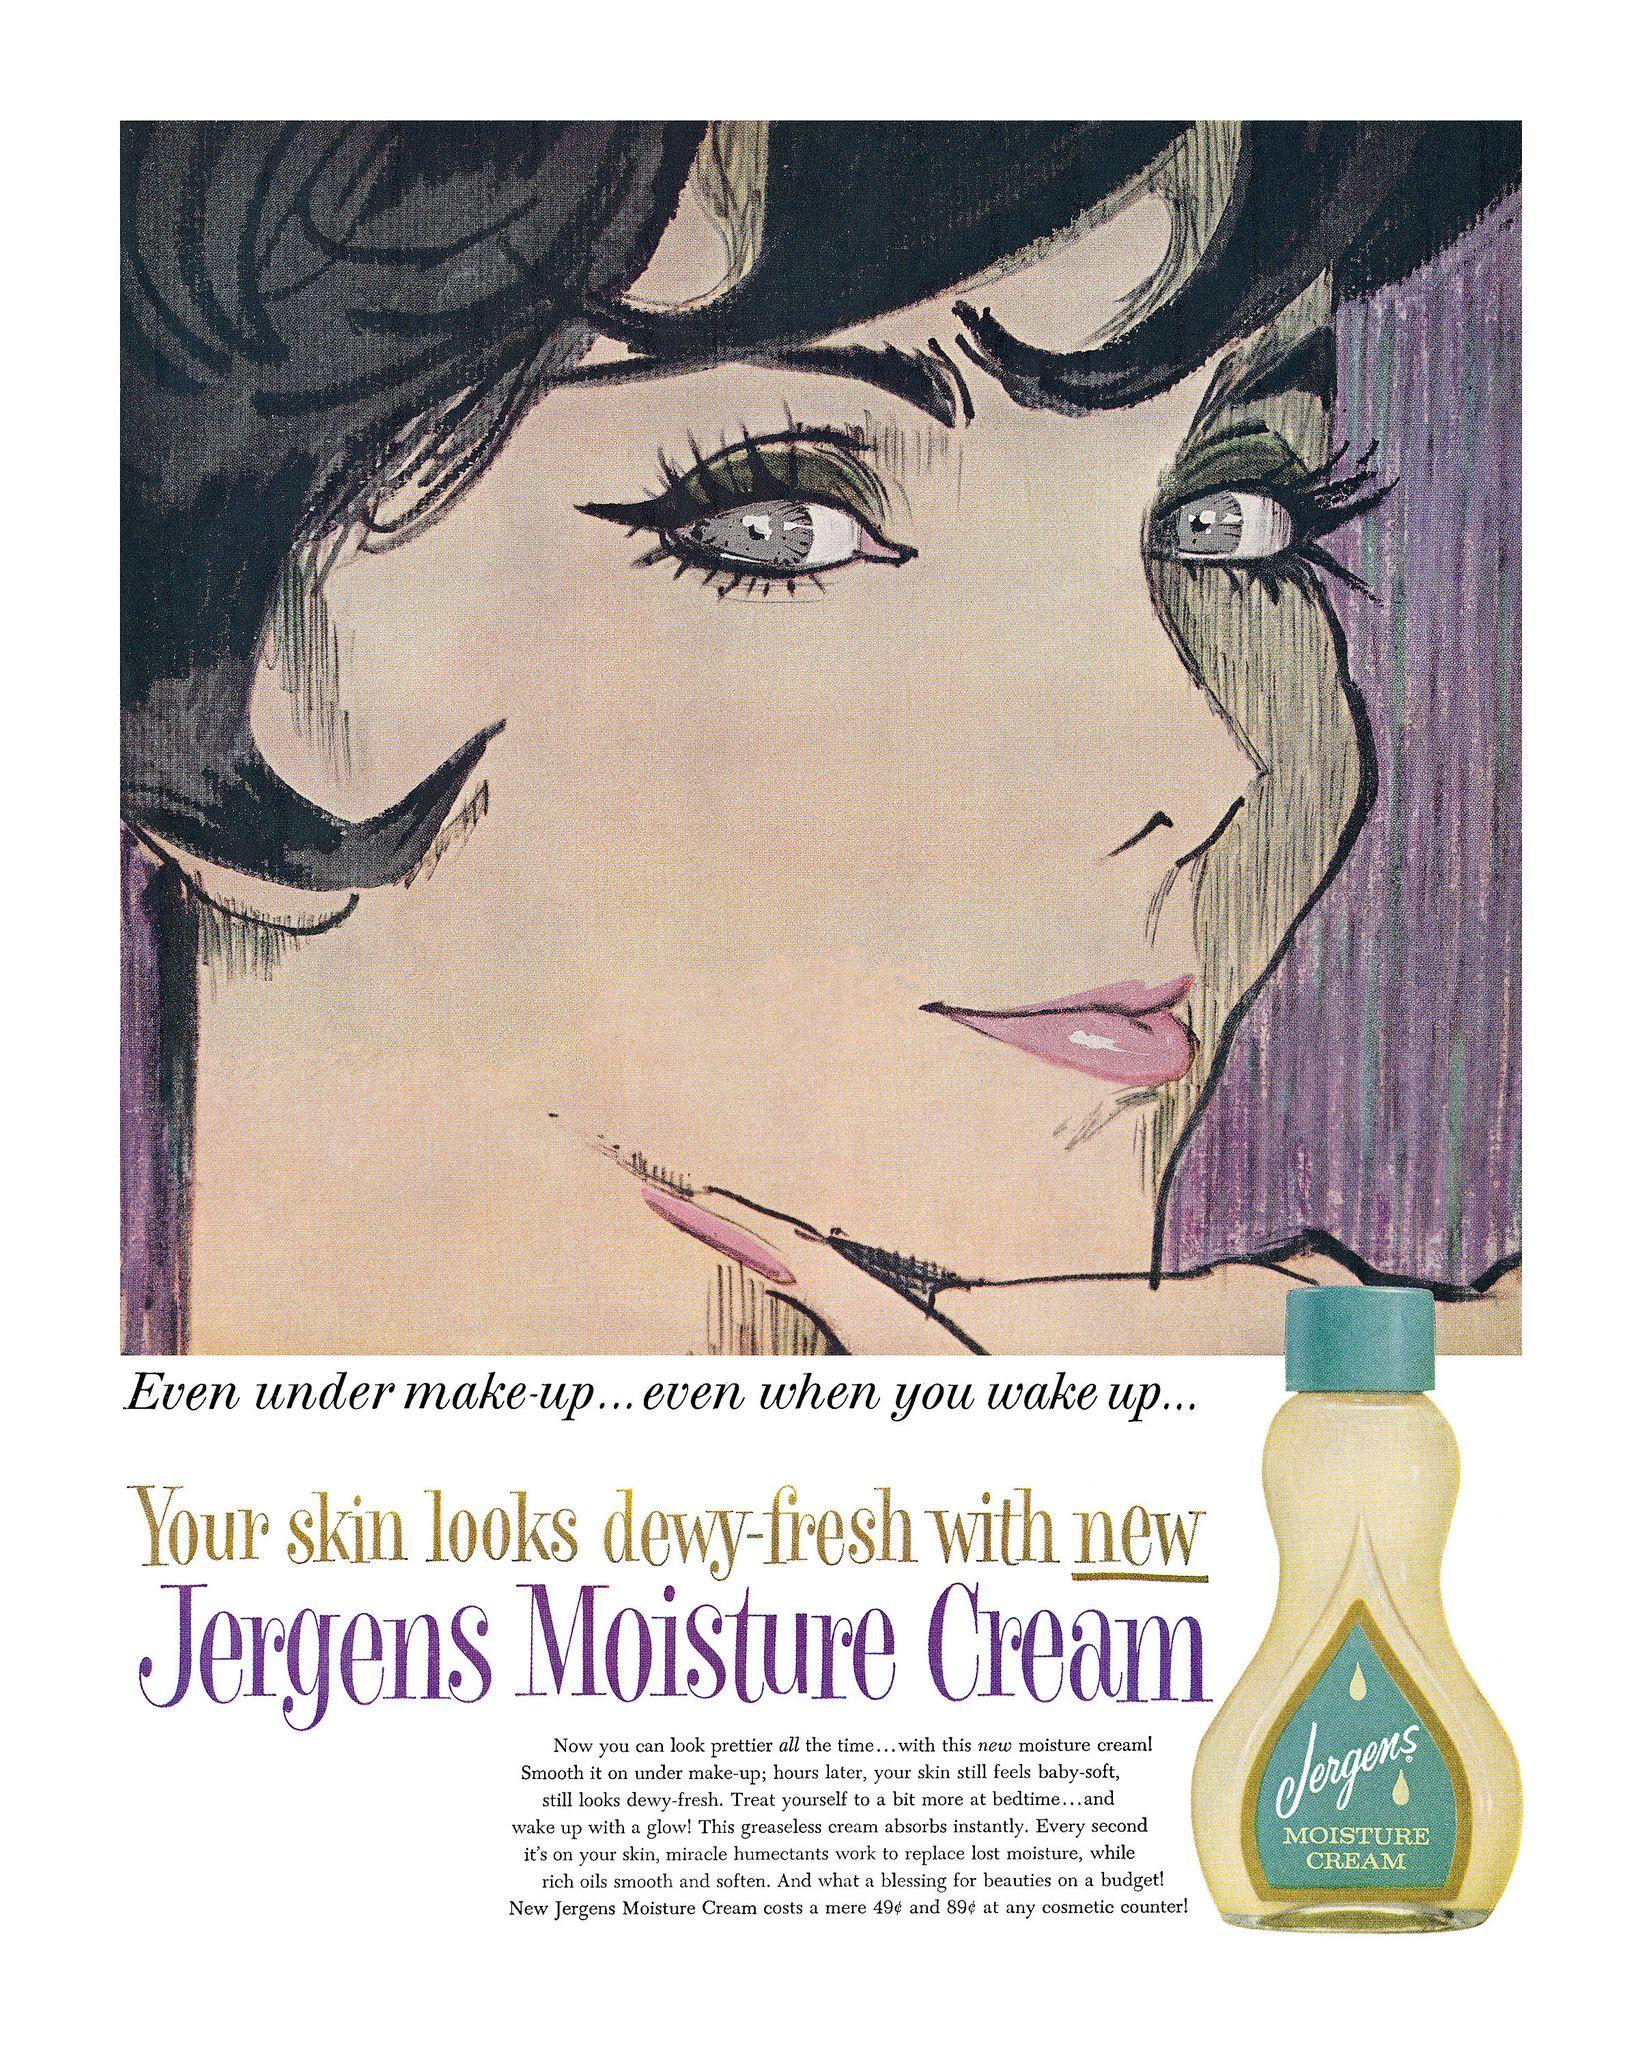 Jergens Moisture Cream ad